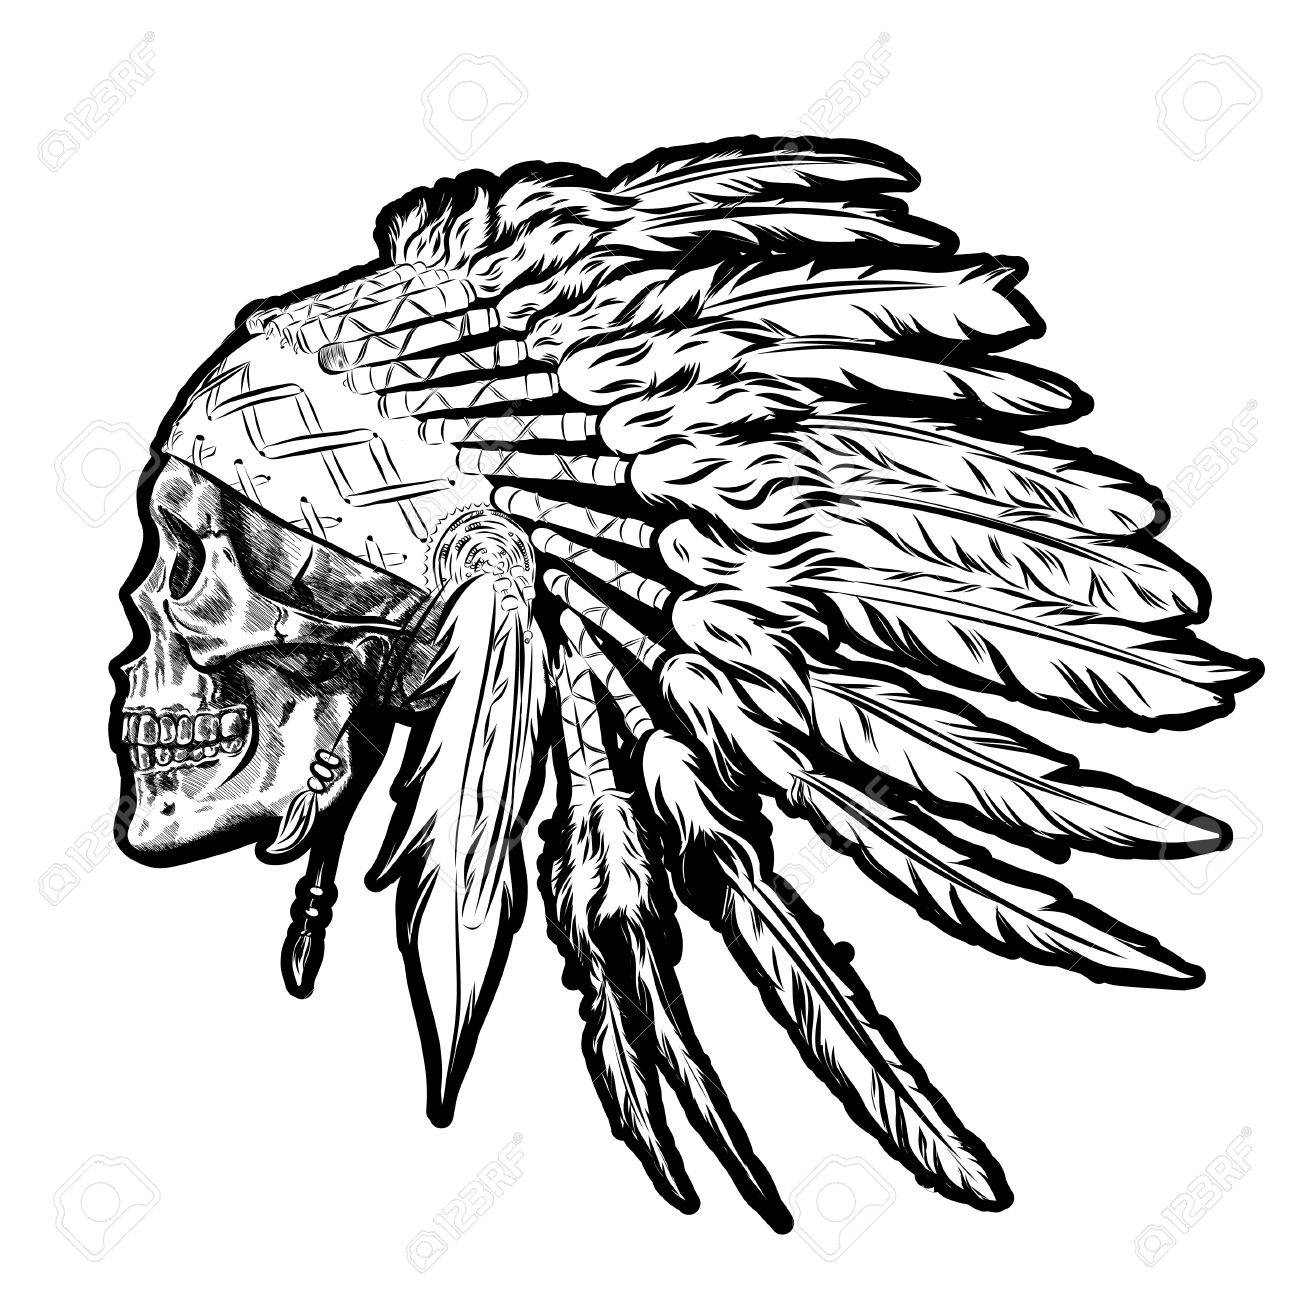 1300x1300 Headdress Clipart Indian Chief